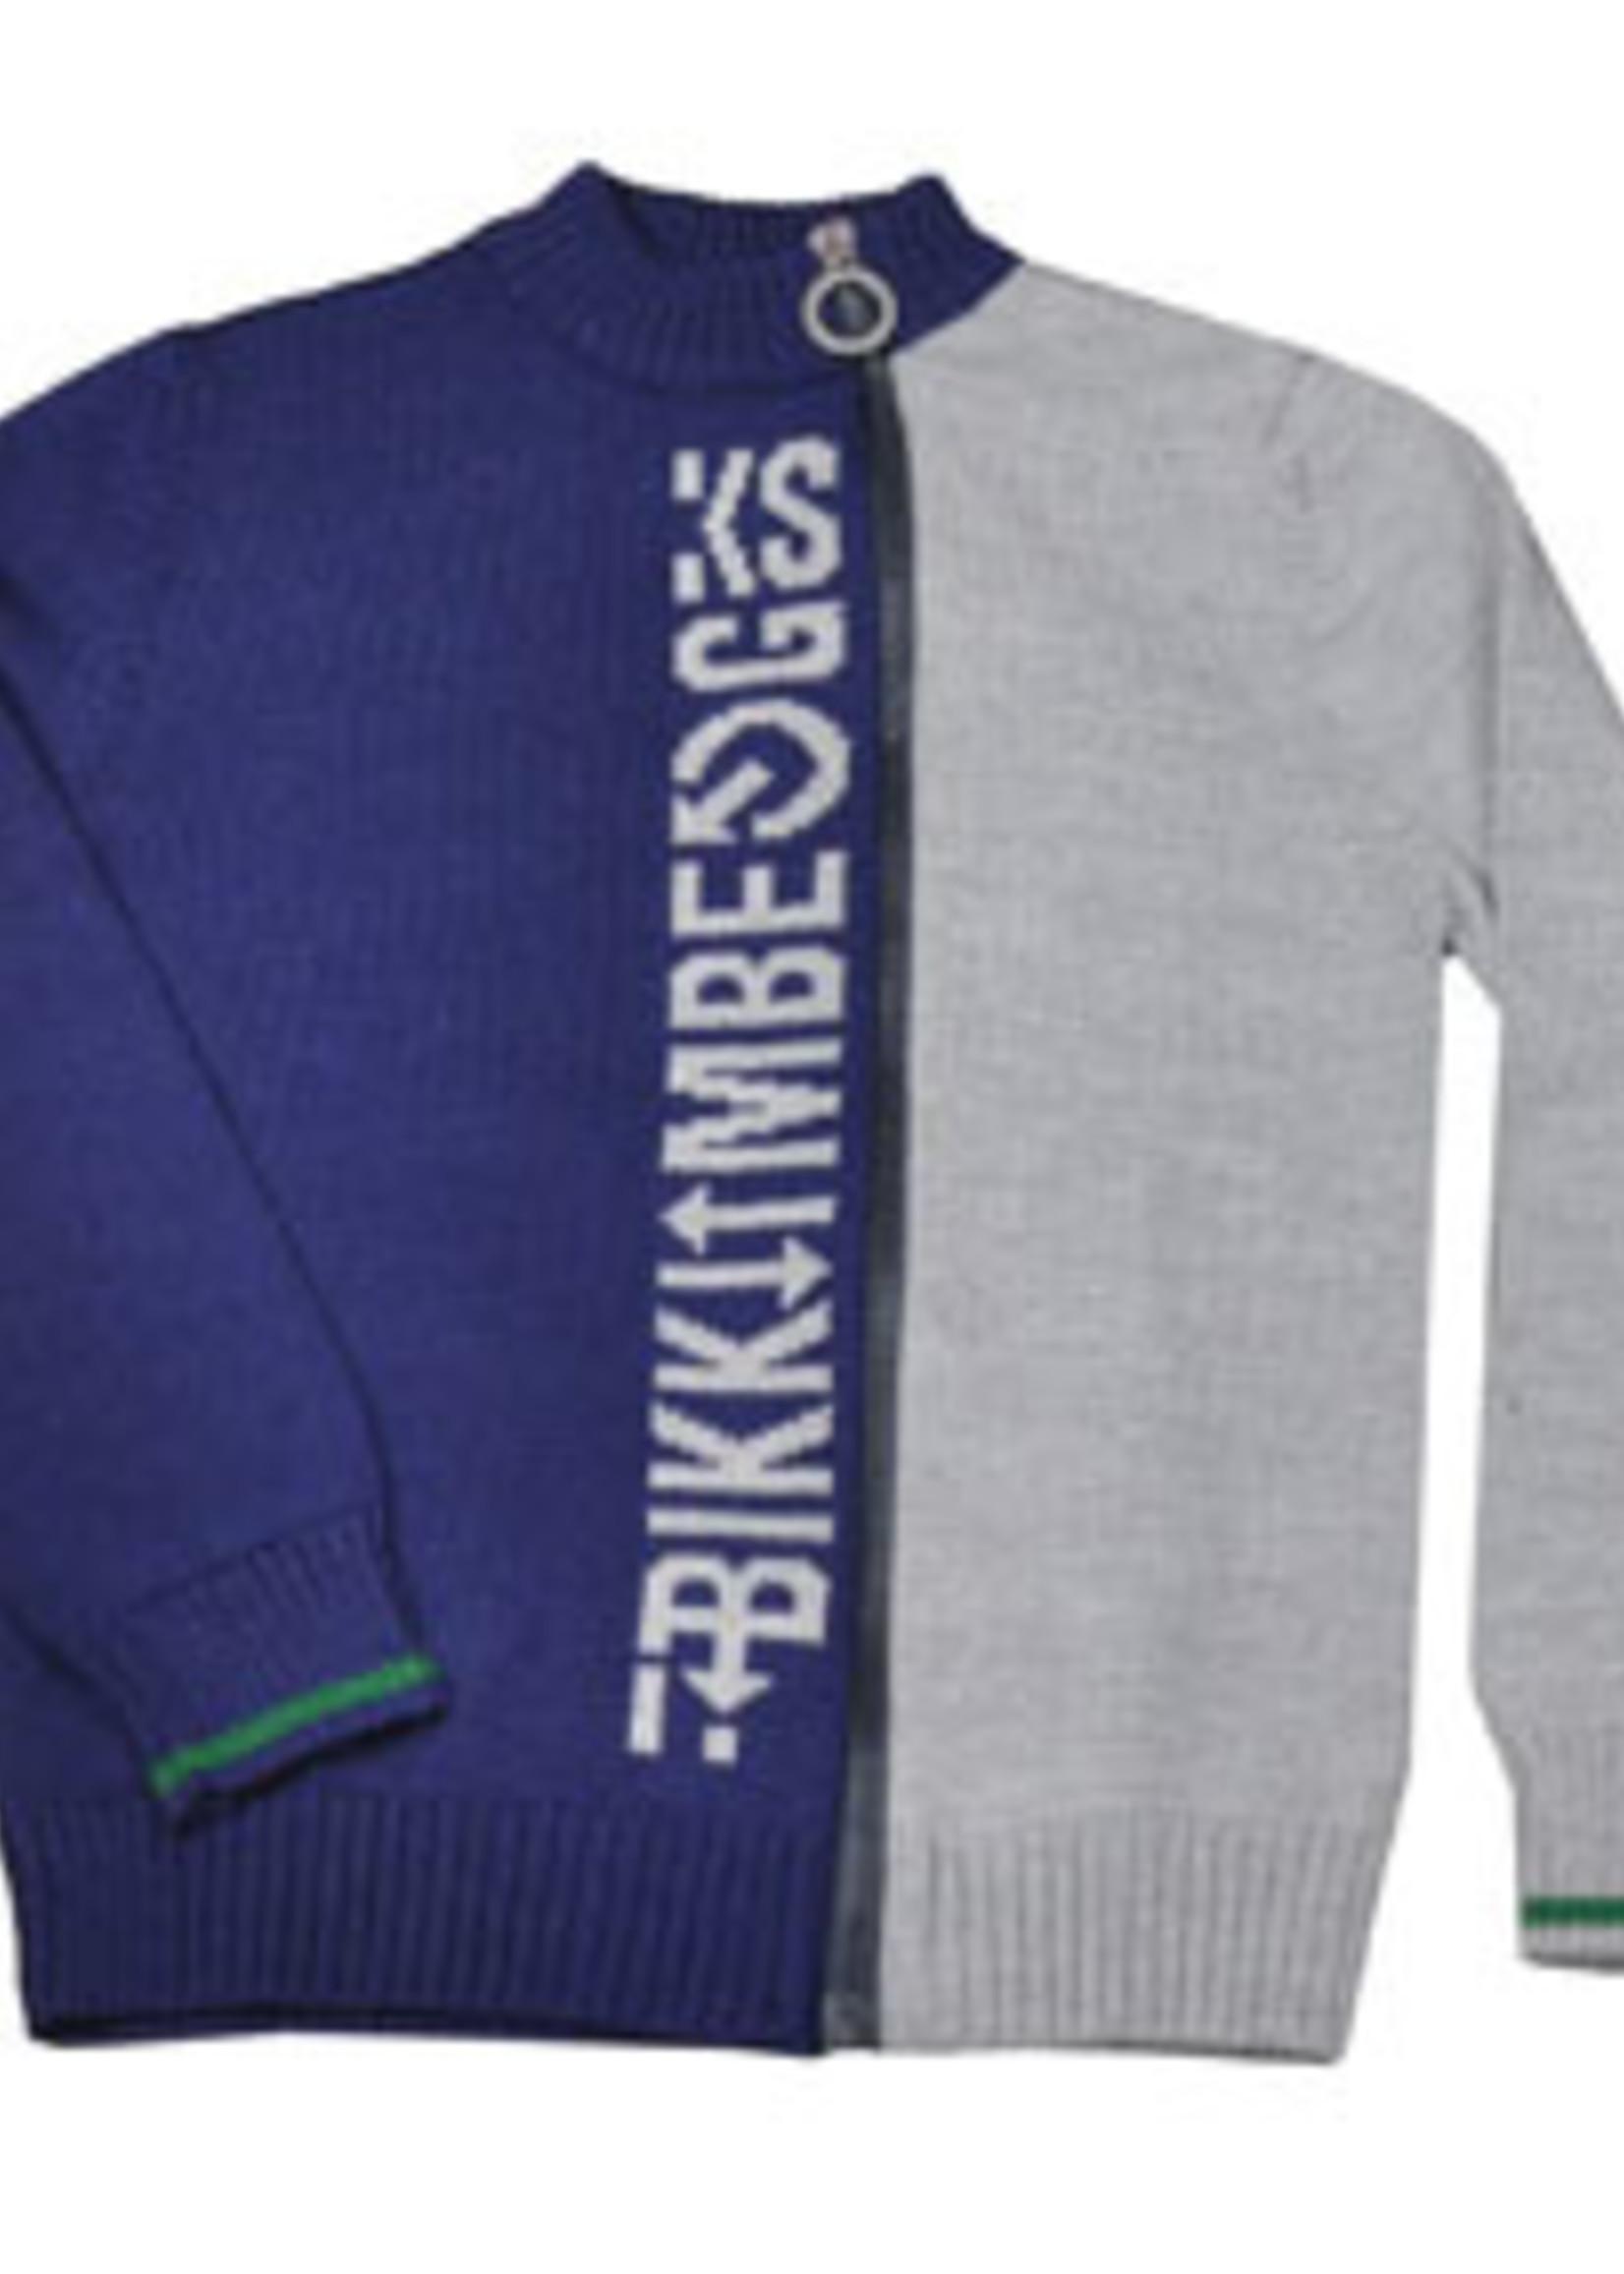 Bikkembergs BIKKEMBERGS CARDIGAN NAVY BLUE